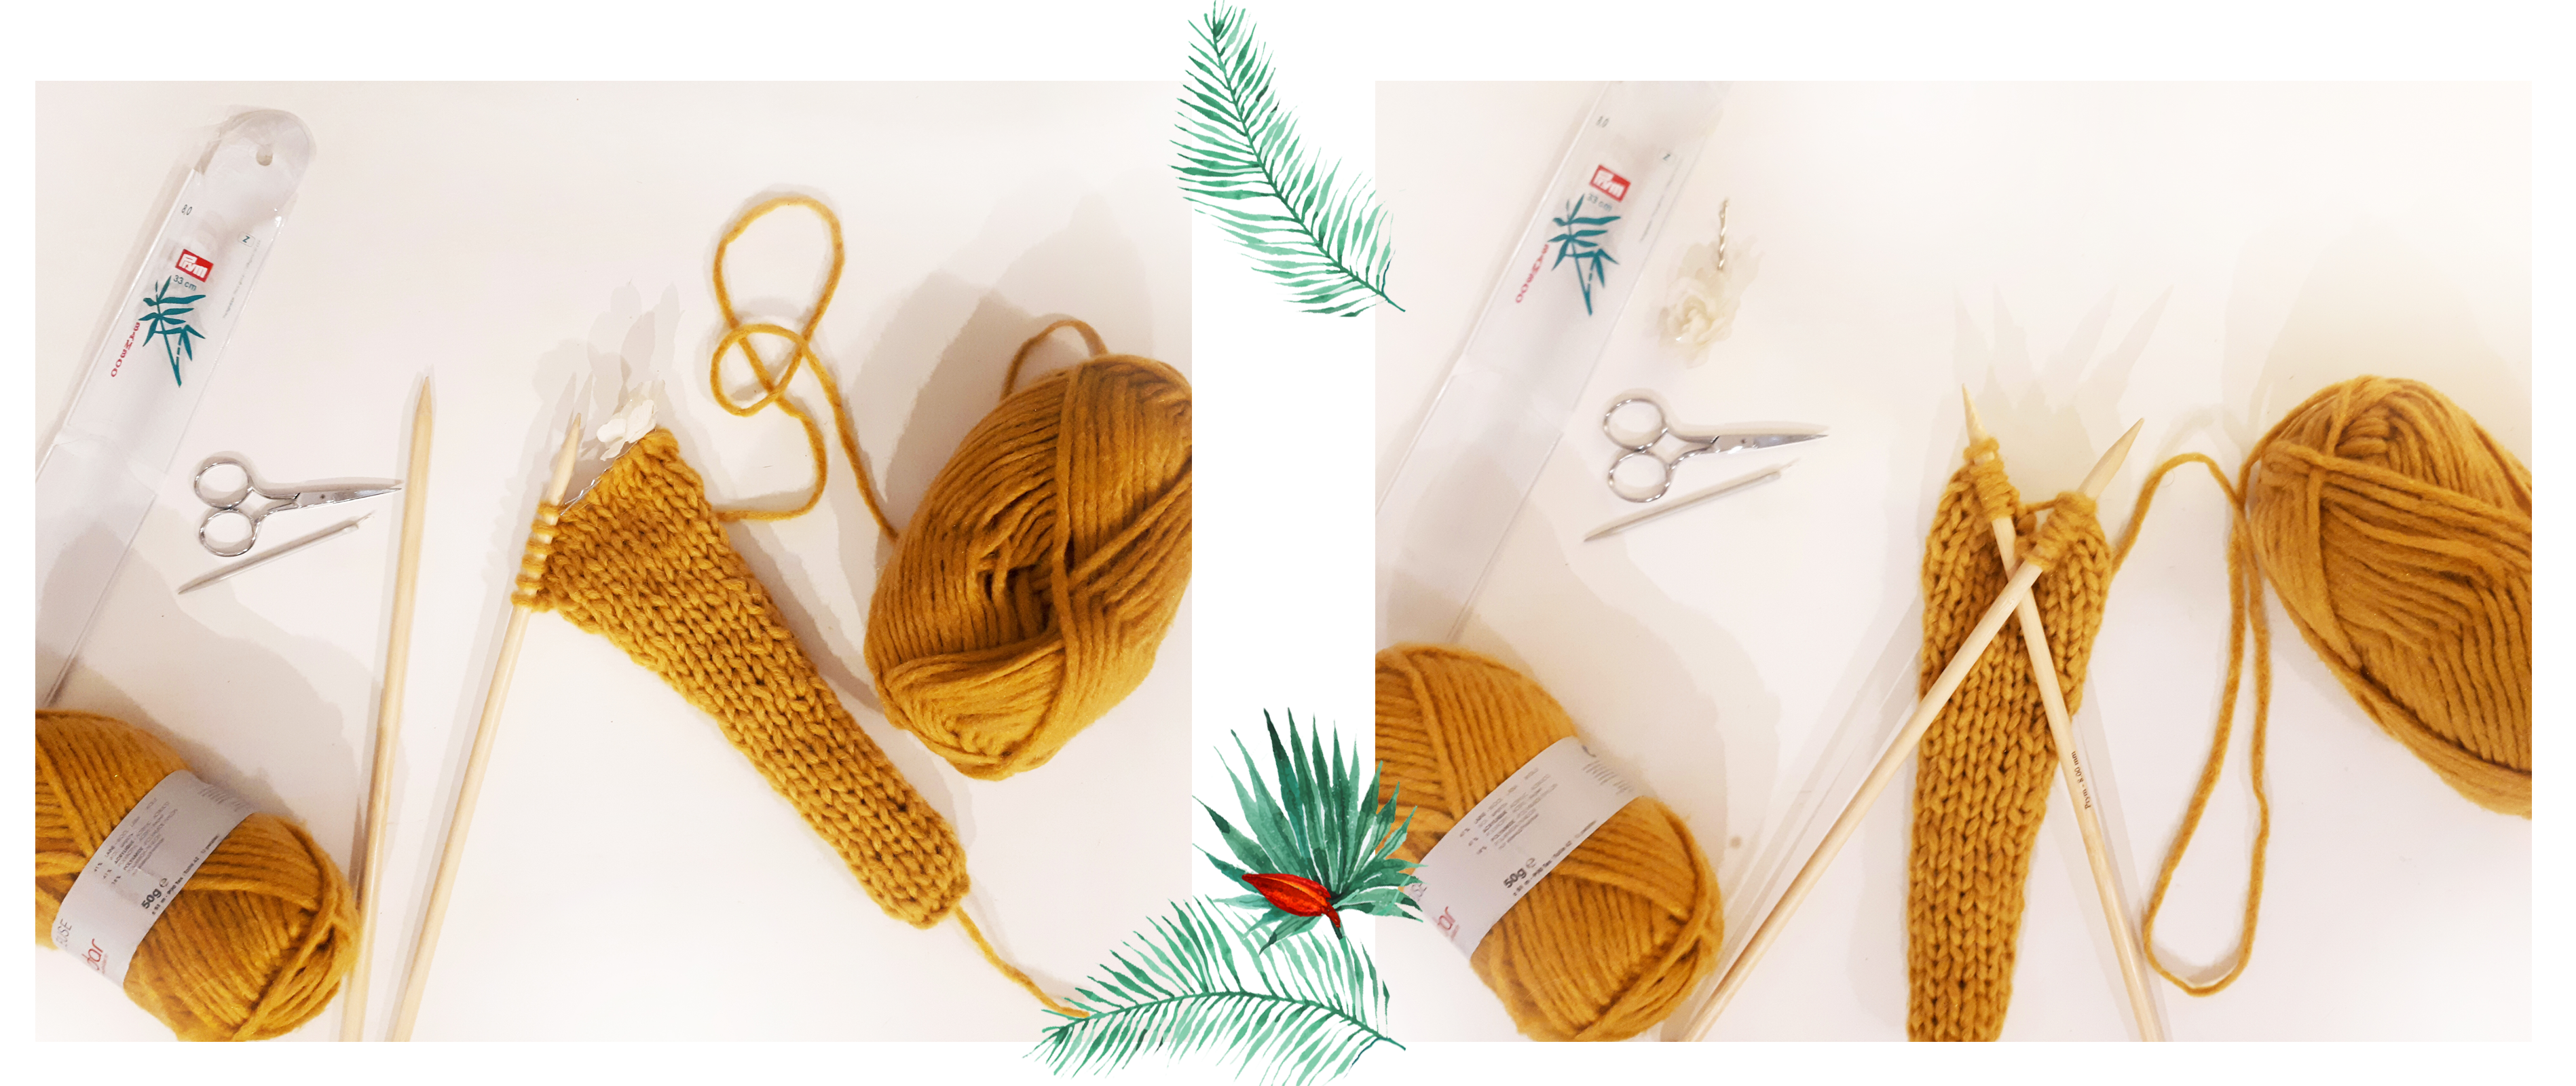 DIY-headband-twist-etape-3-4-Cactus-and-Style